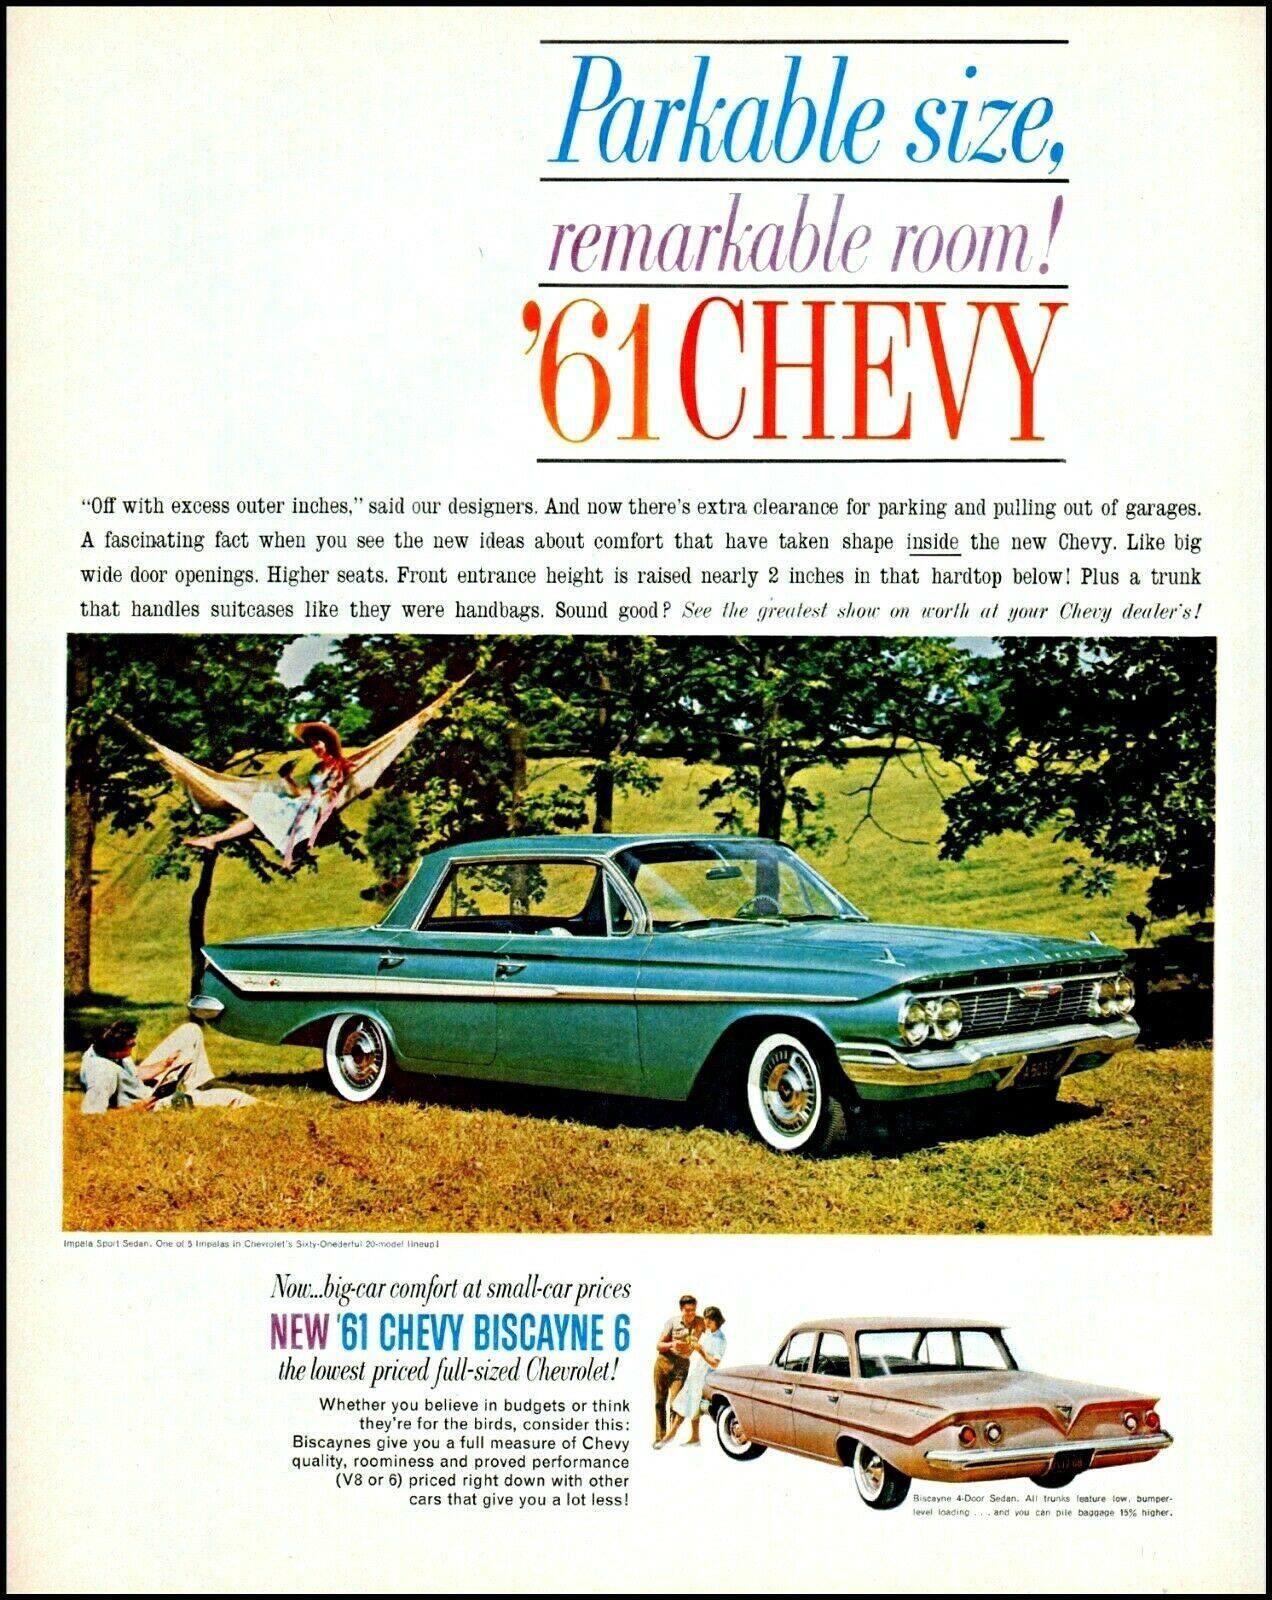 1965 Chevrolet Line Promotional Advertising Poster